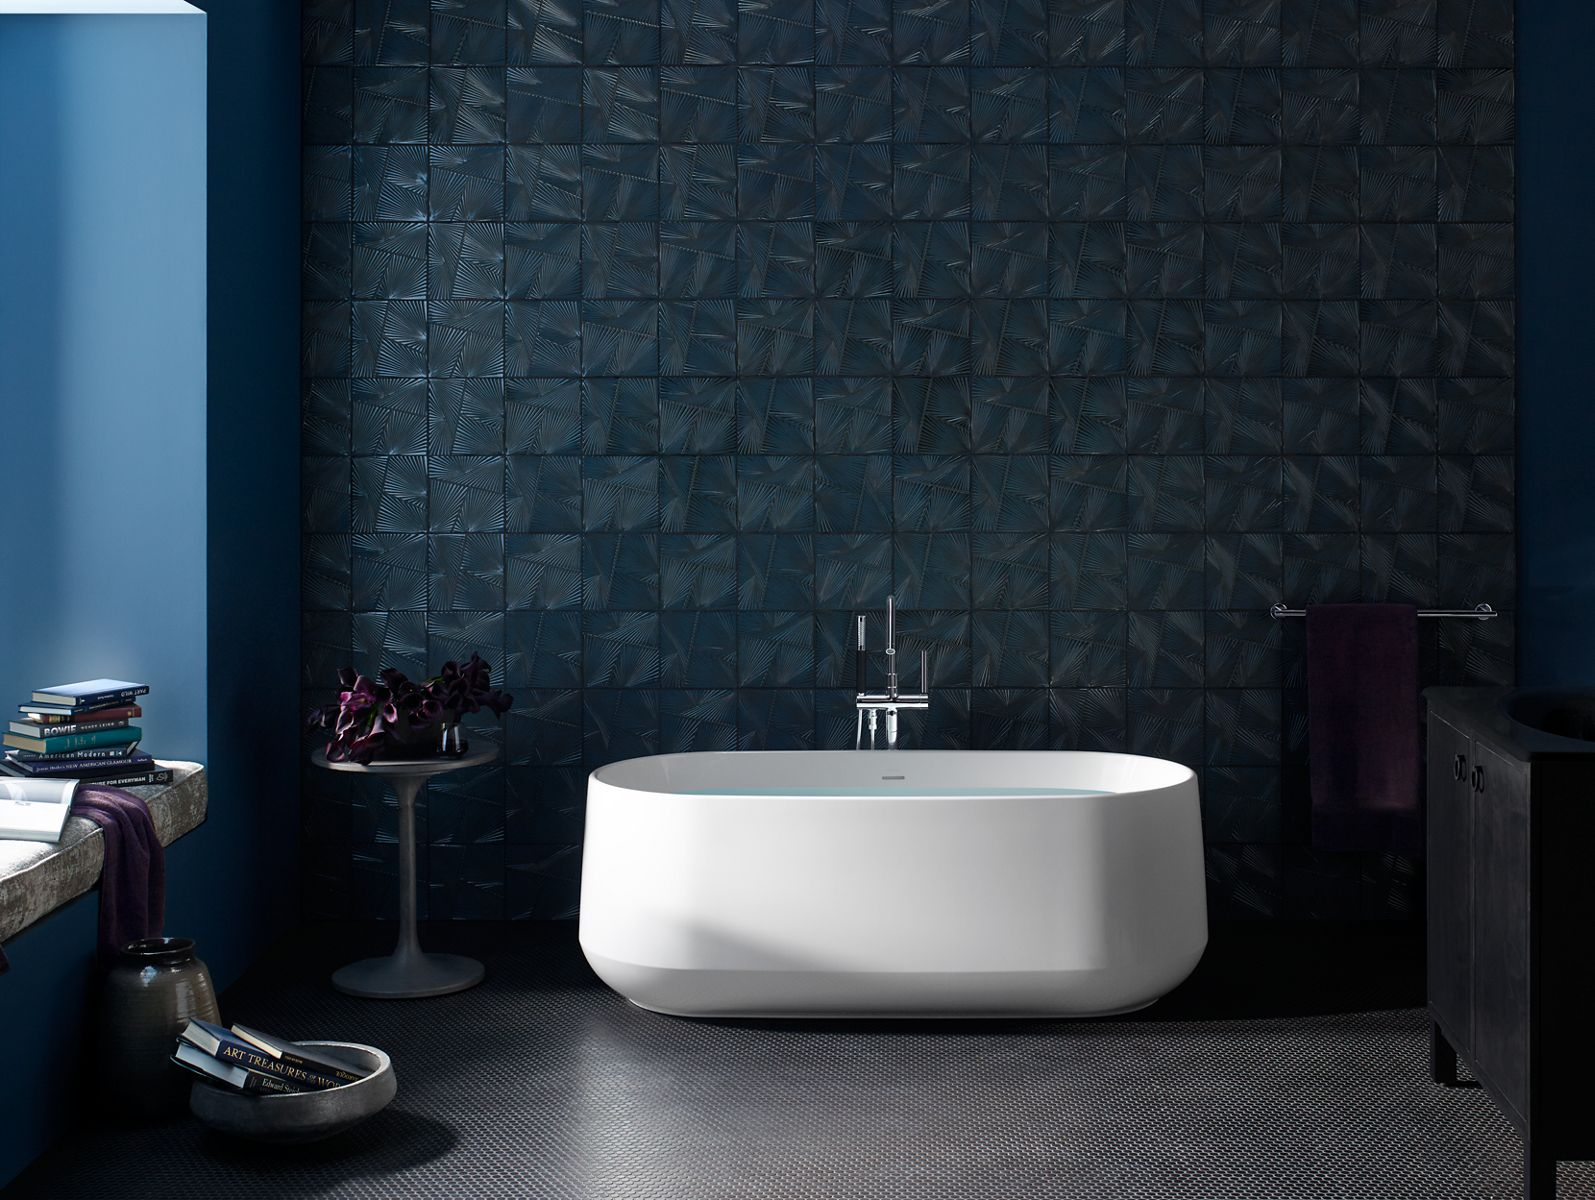 Kohler\'s New Freestanding Baths Nod to Brand\'s History Through ...